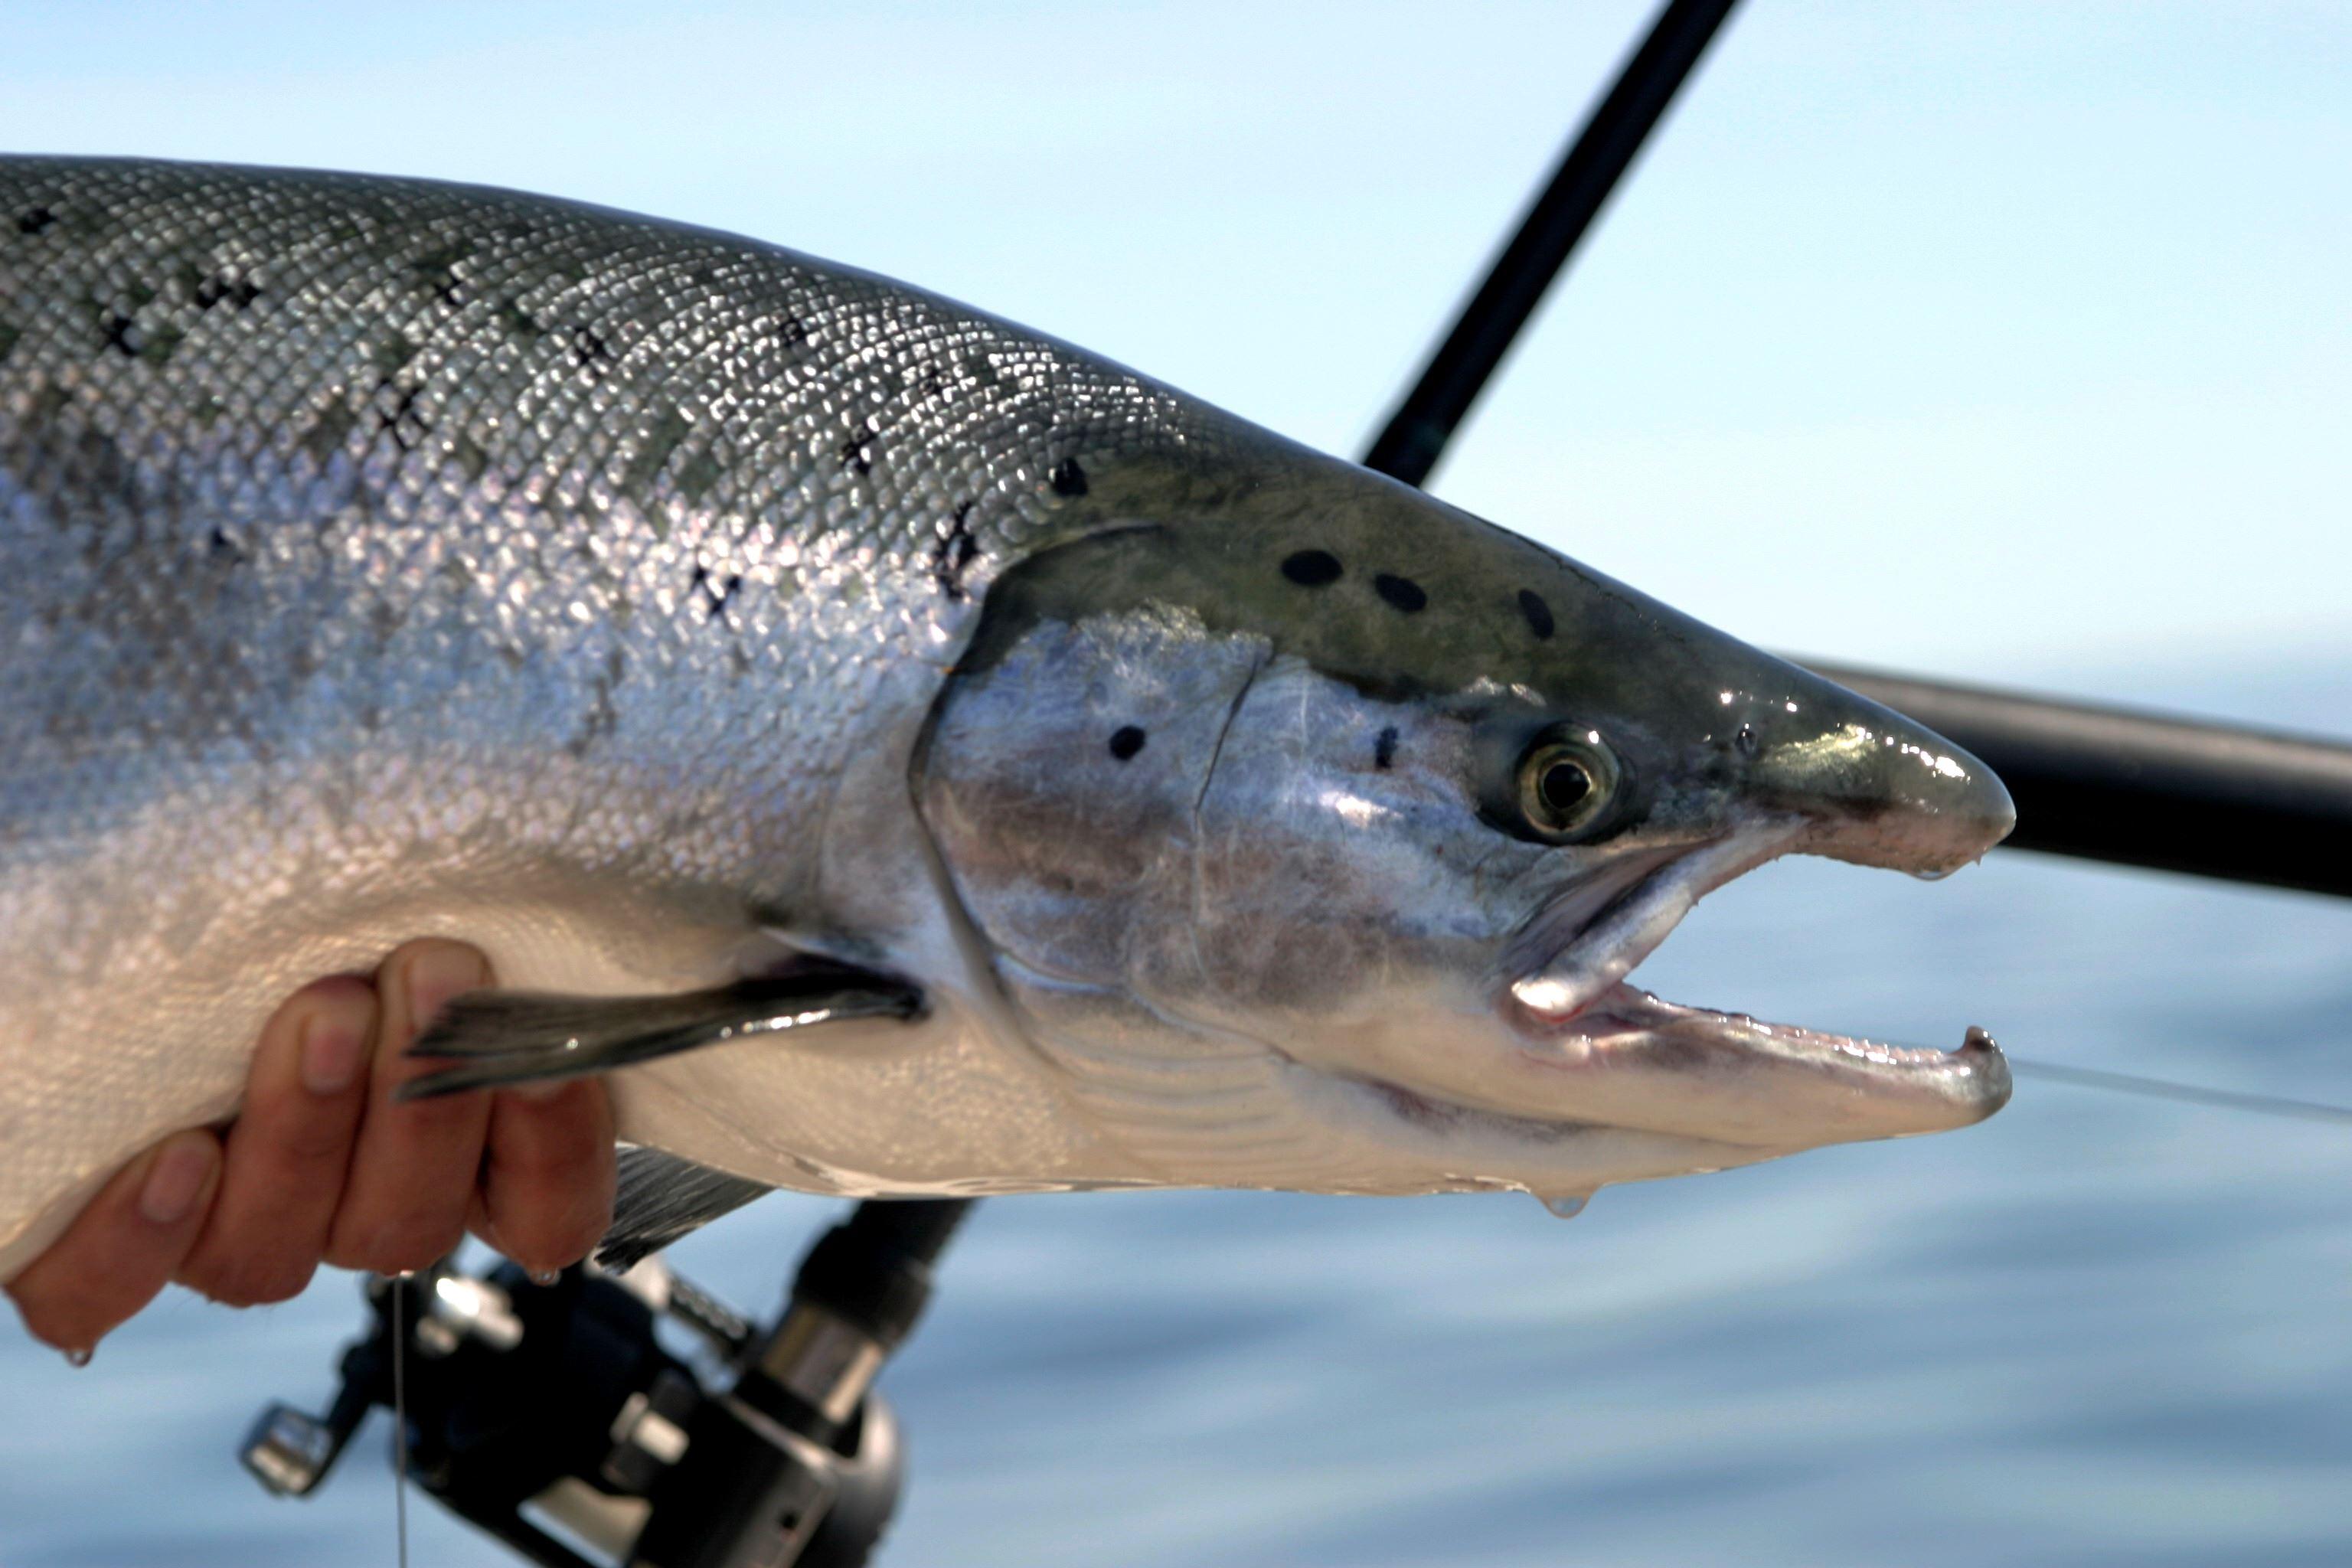 Hammarudda kalastajakortti